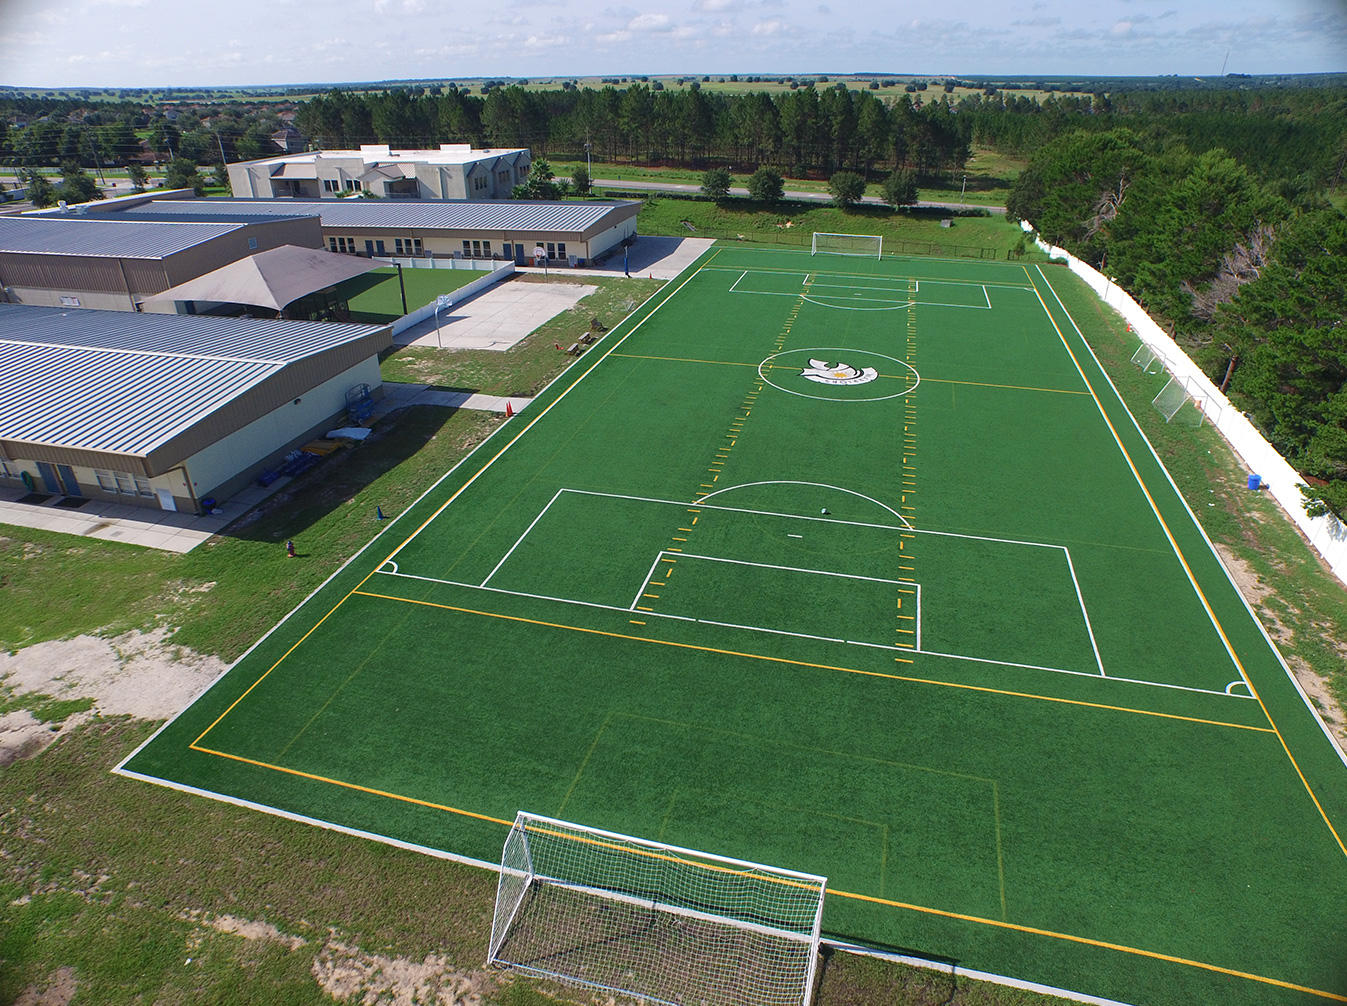 aerial image of turf soccer field